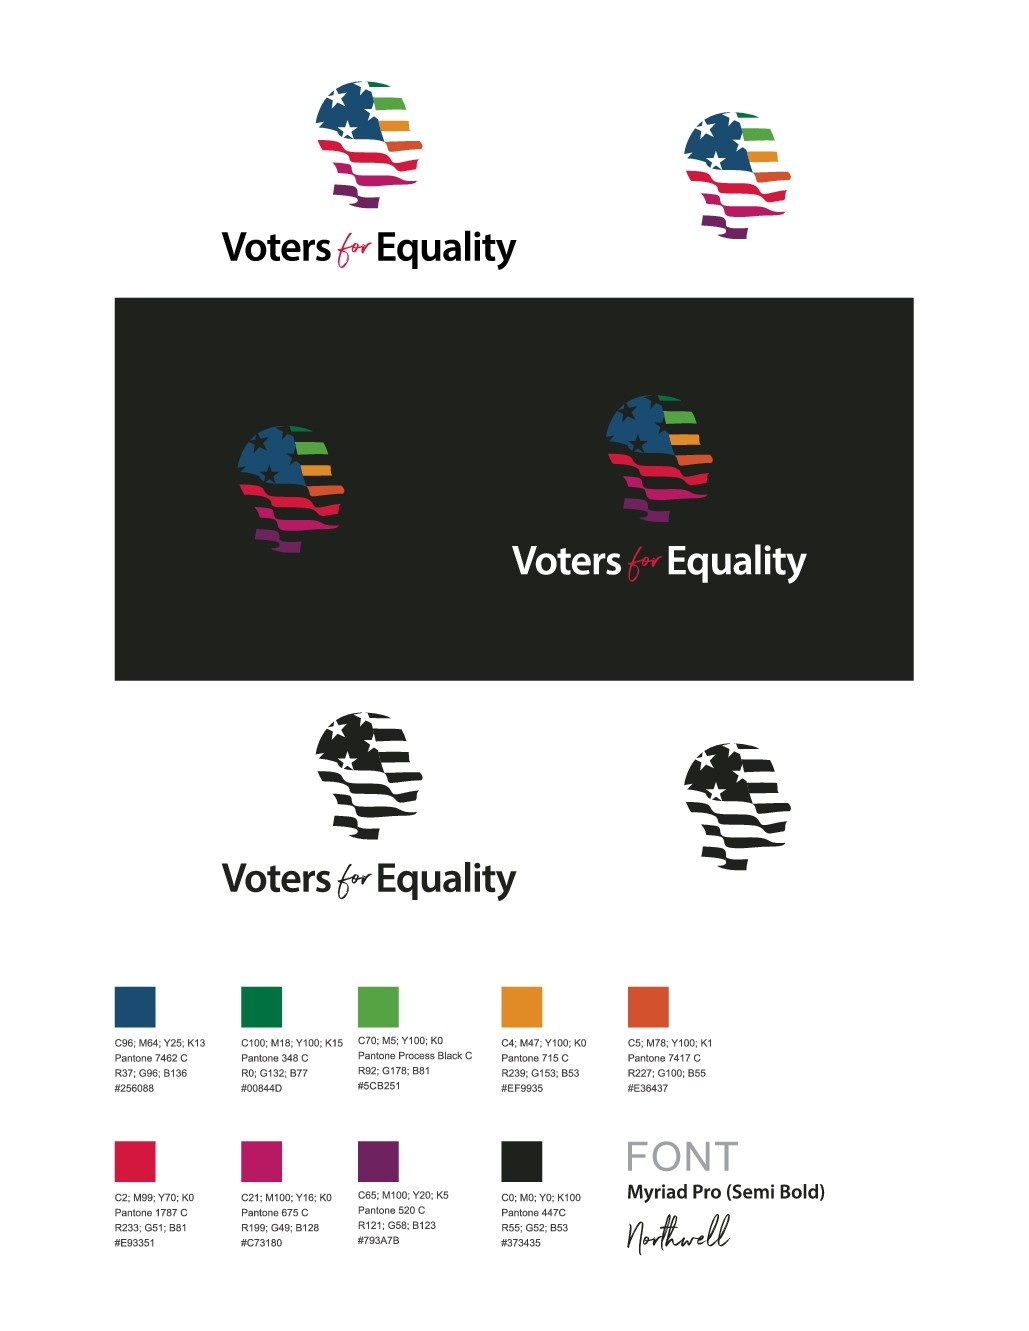 Design a modern, viral, iconic logo for LGBTQ equality organization